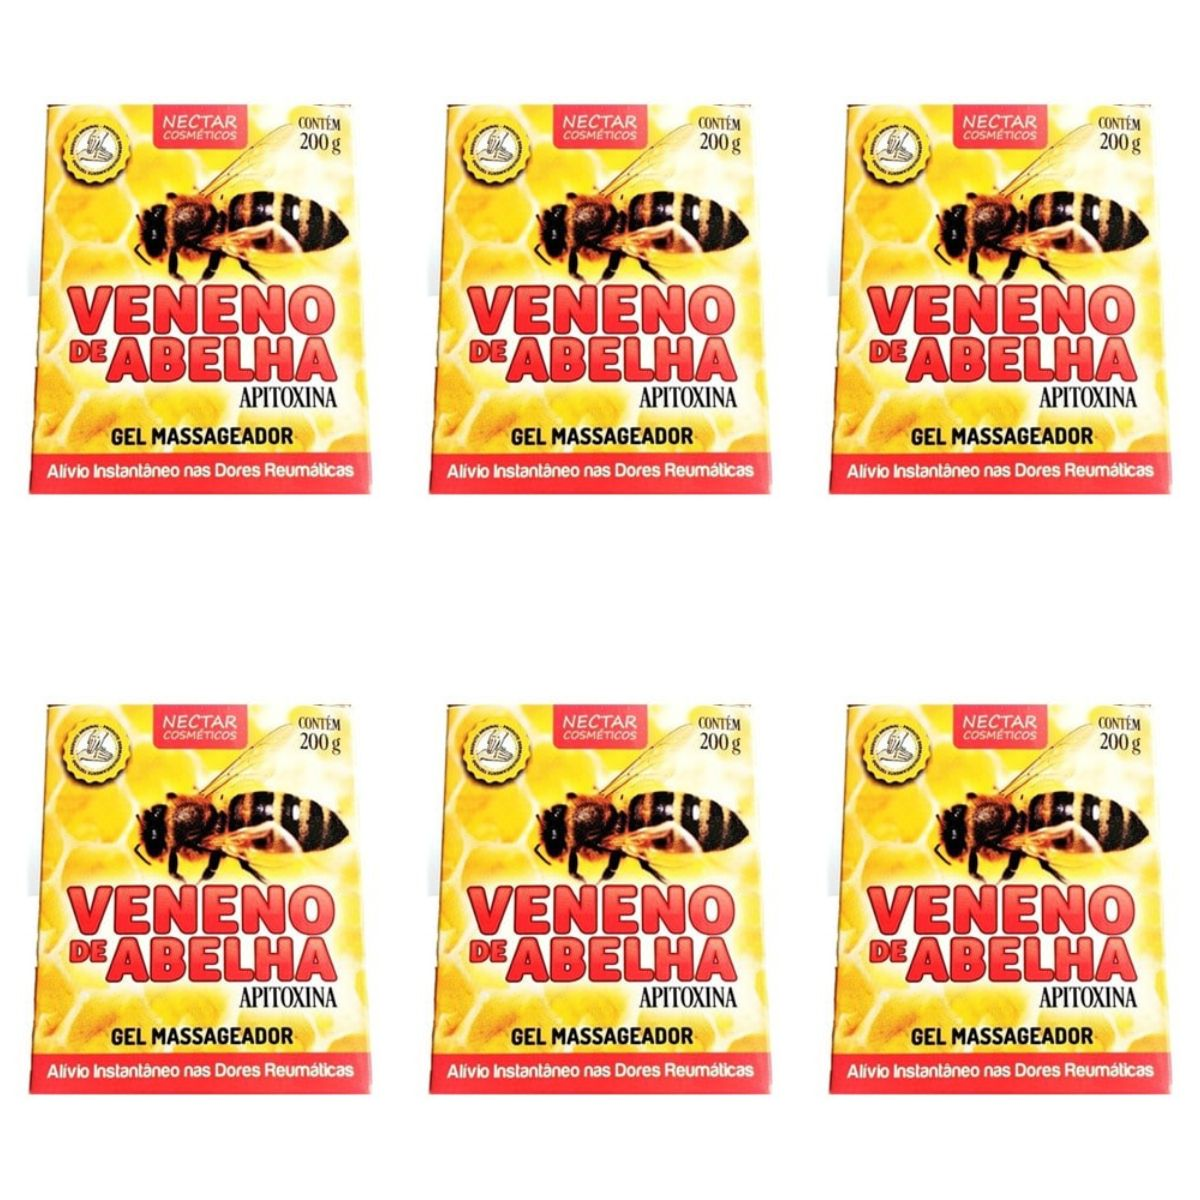 Kit Com 6 Cremes Veneno De Abelha - 200Gr